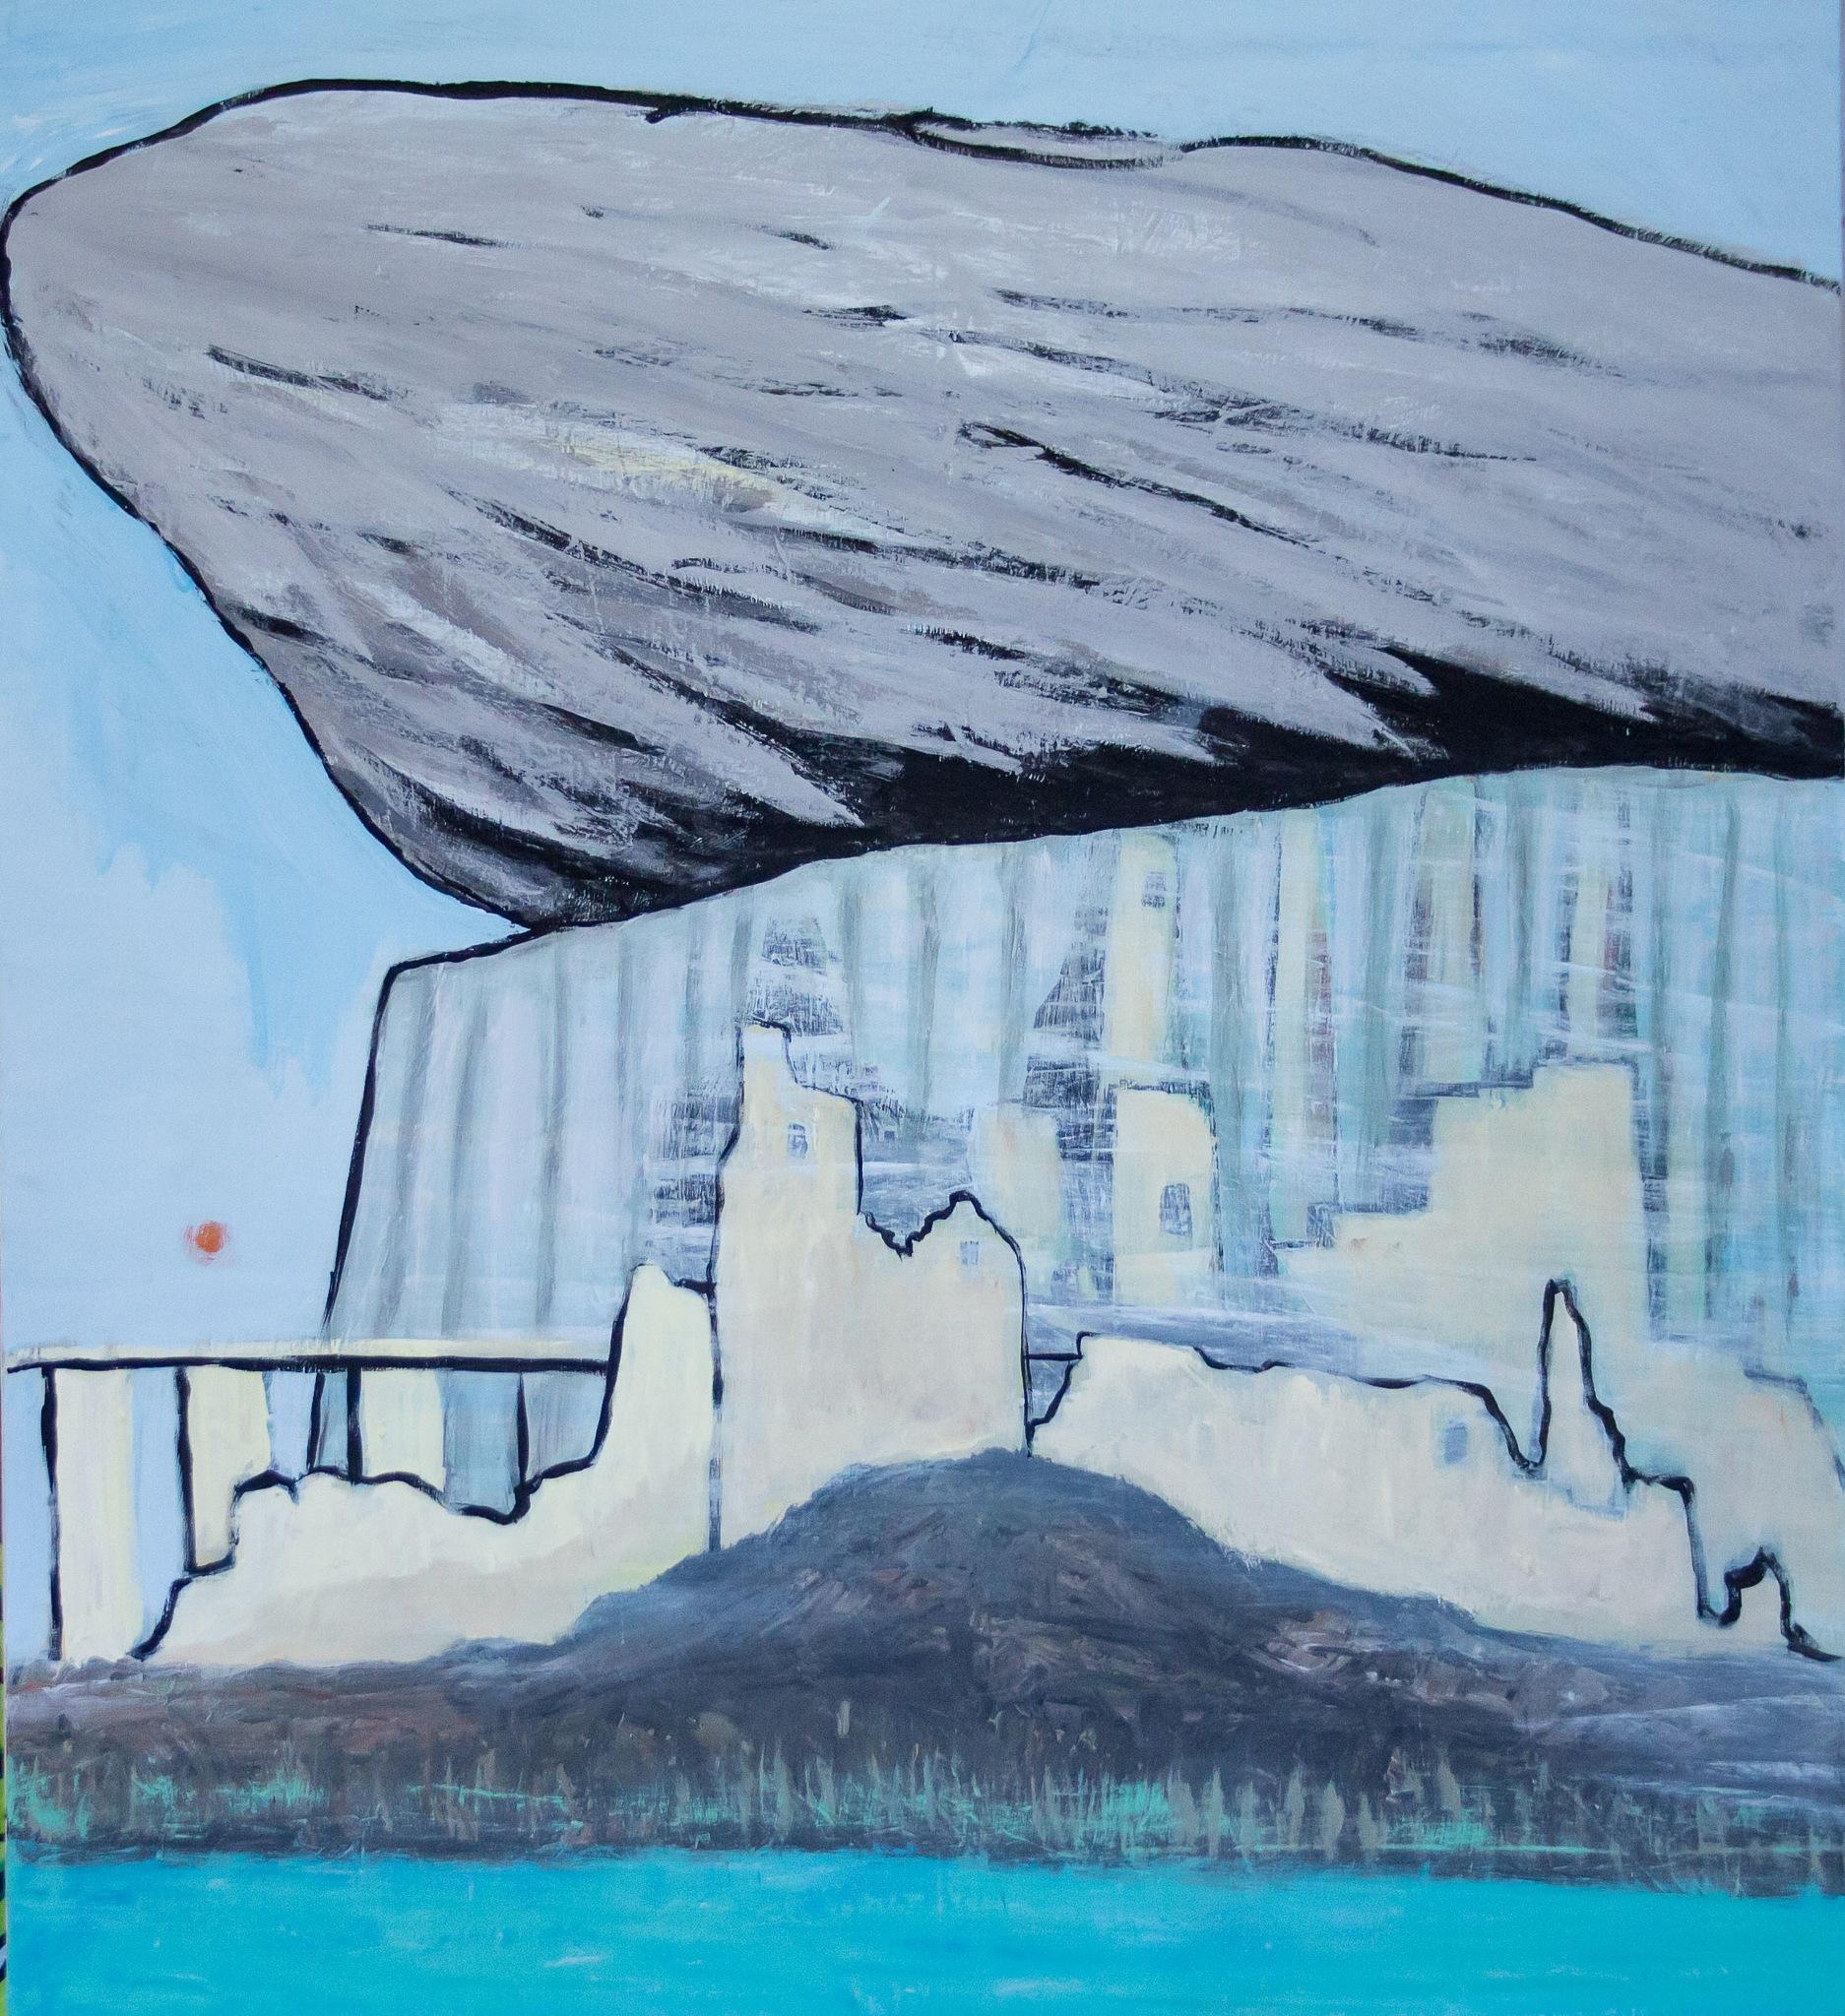 Whale above landscape by derkolaan